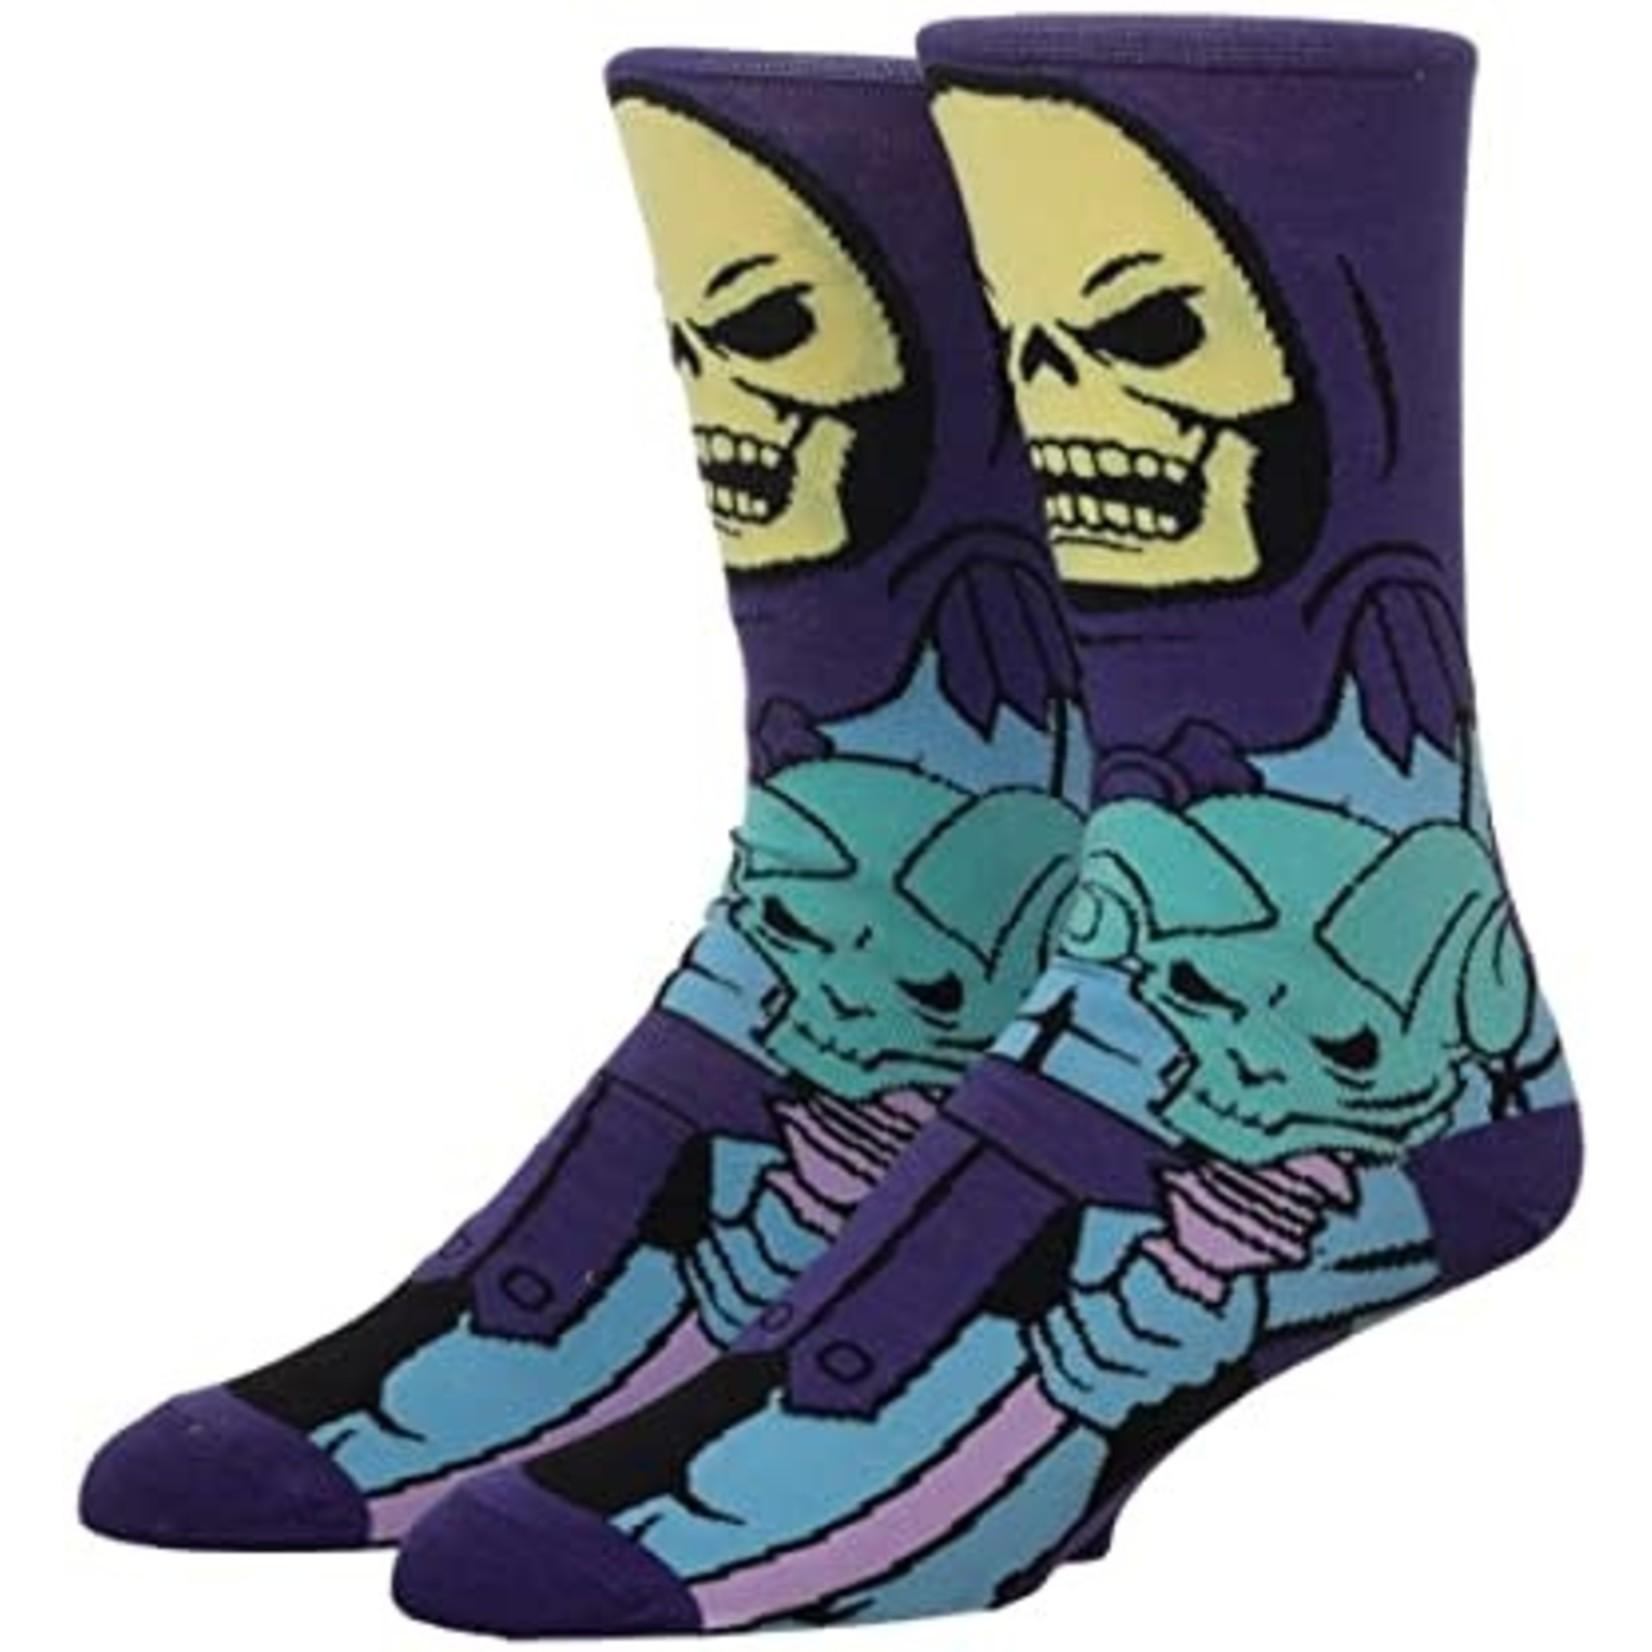 Socks (Mens) - Skeletor